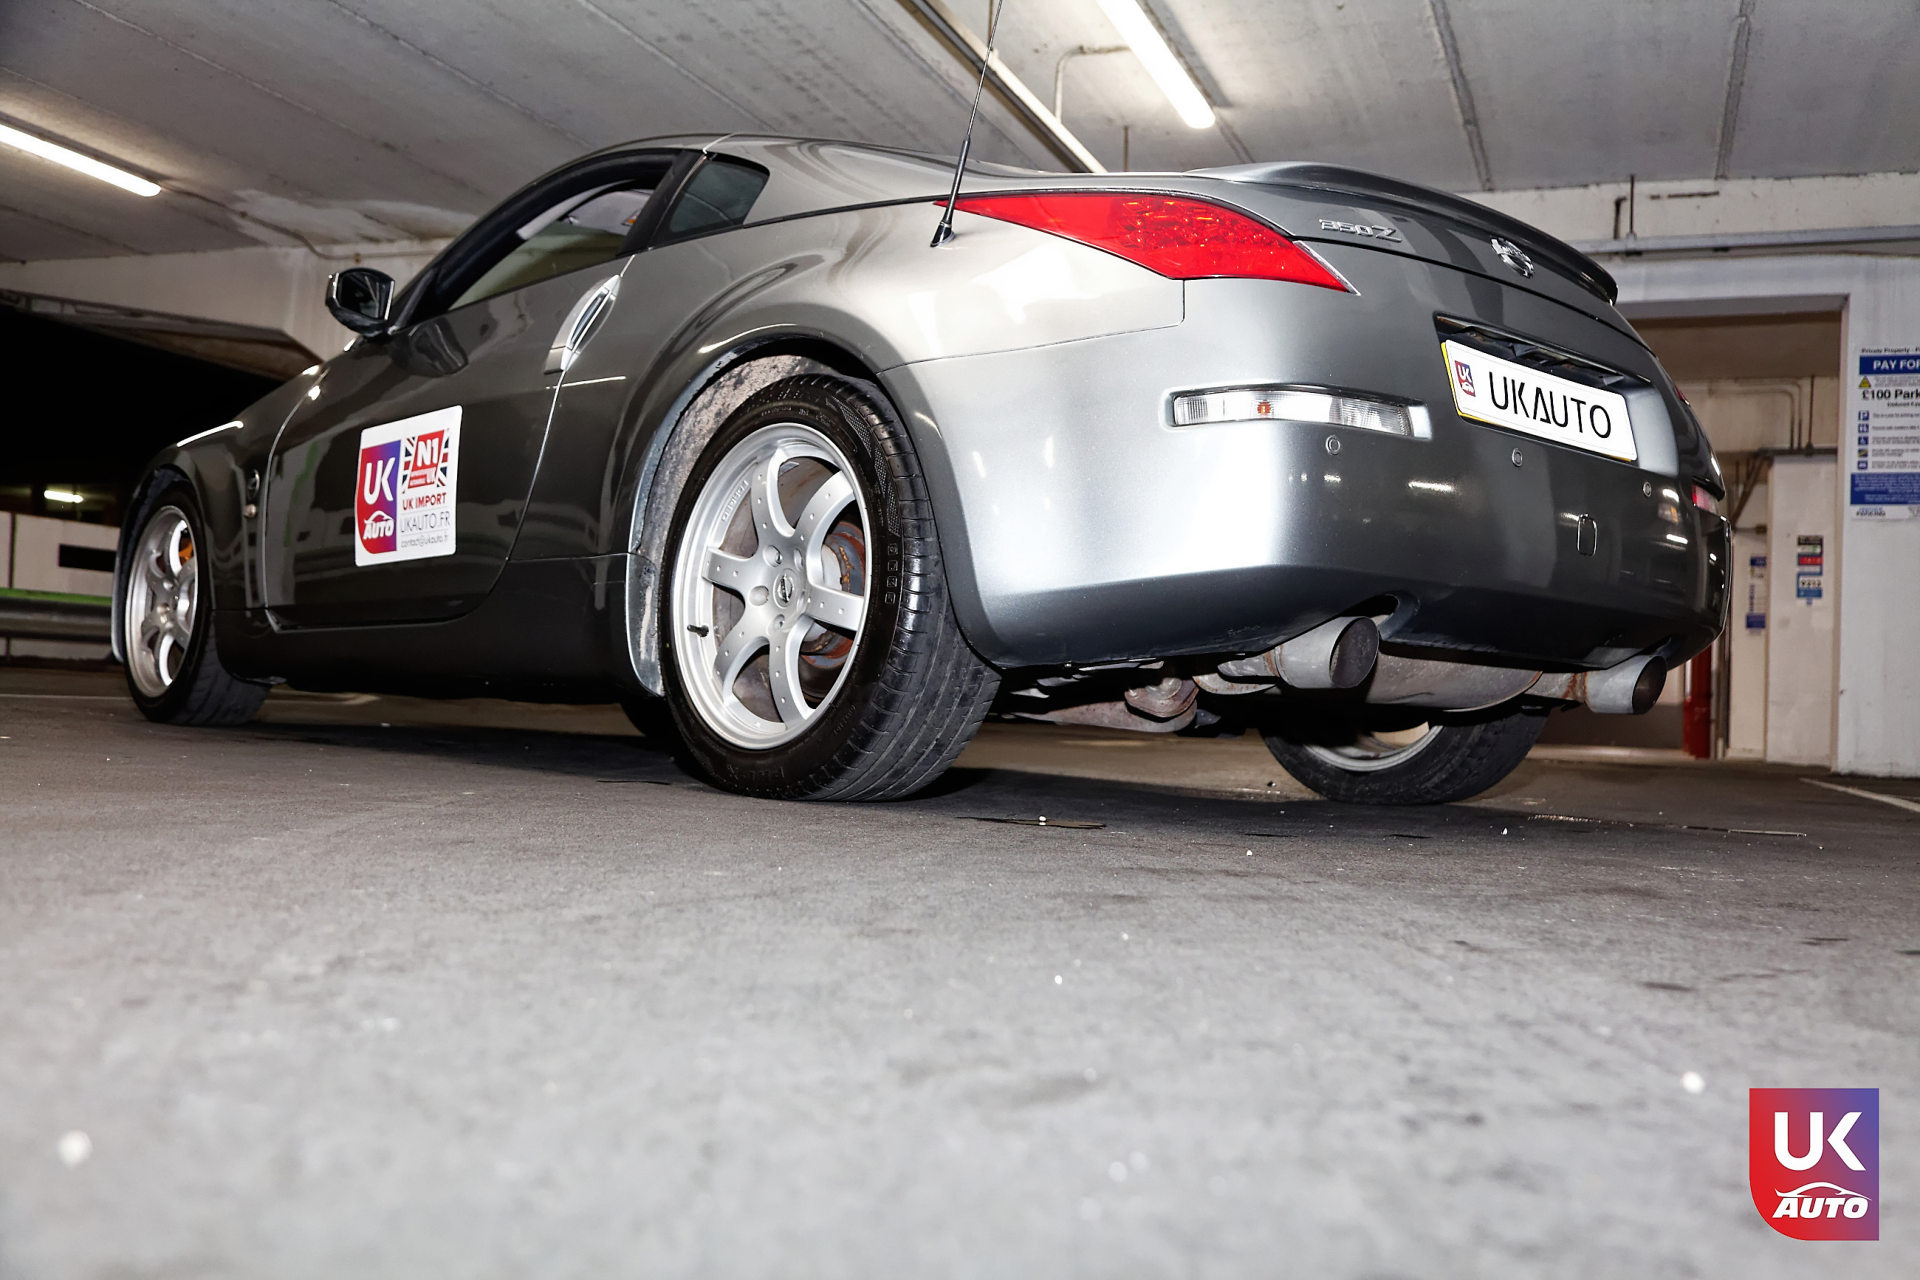 Nissan 350z rhd v6 nissan angleterre nissan uk nissan import rhd voiture occasion mandataire nissan 6 DxO - NISSAN ANGLETERRE IMPORT NISSAN 350Z V6 RHD 3.5 MANDATAIRE NISSAN AUTO AVANT LE BREXIT FELICITATION A XABI